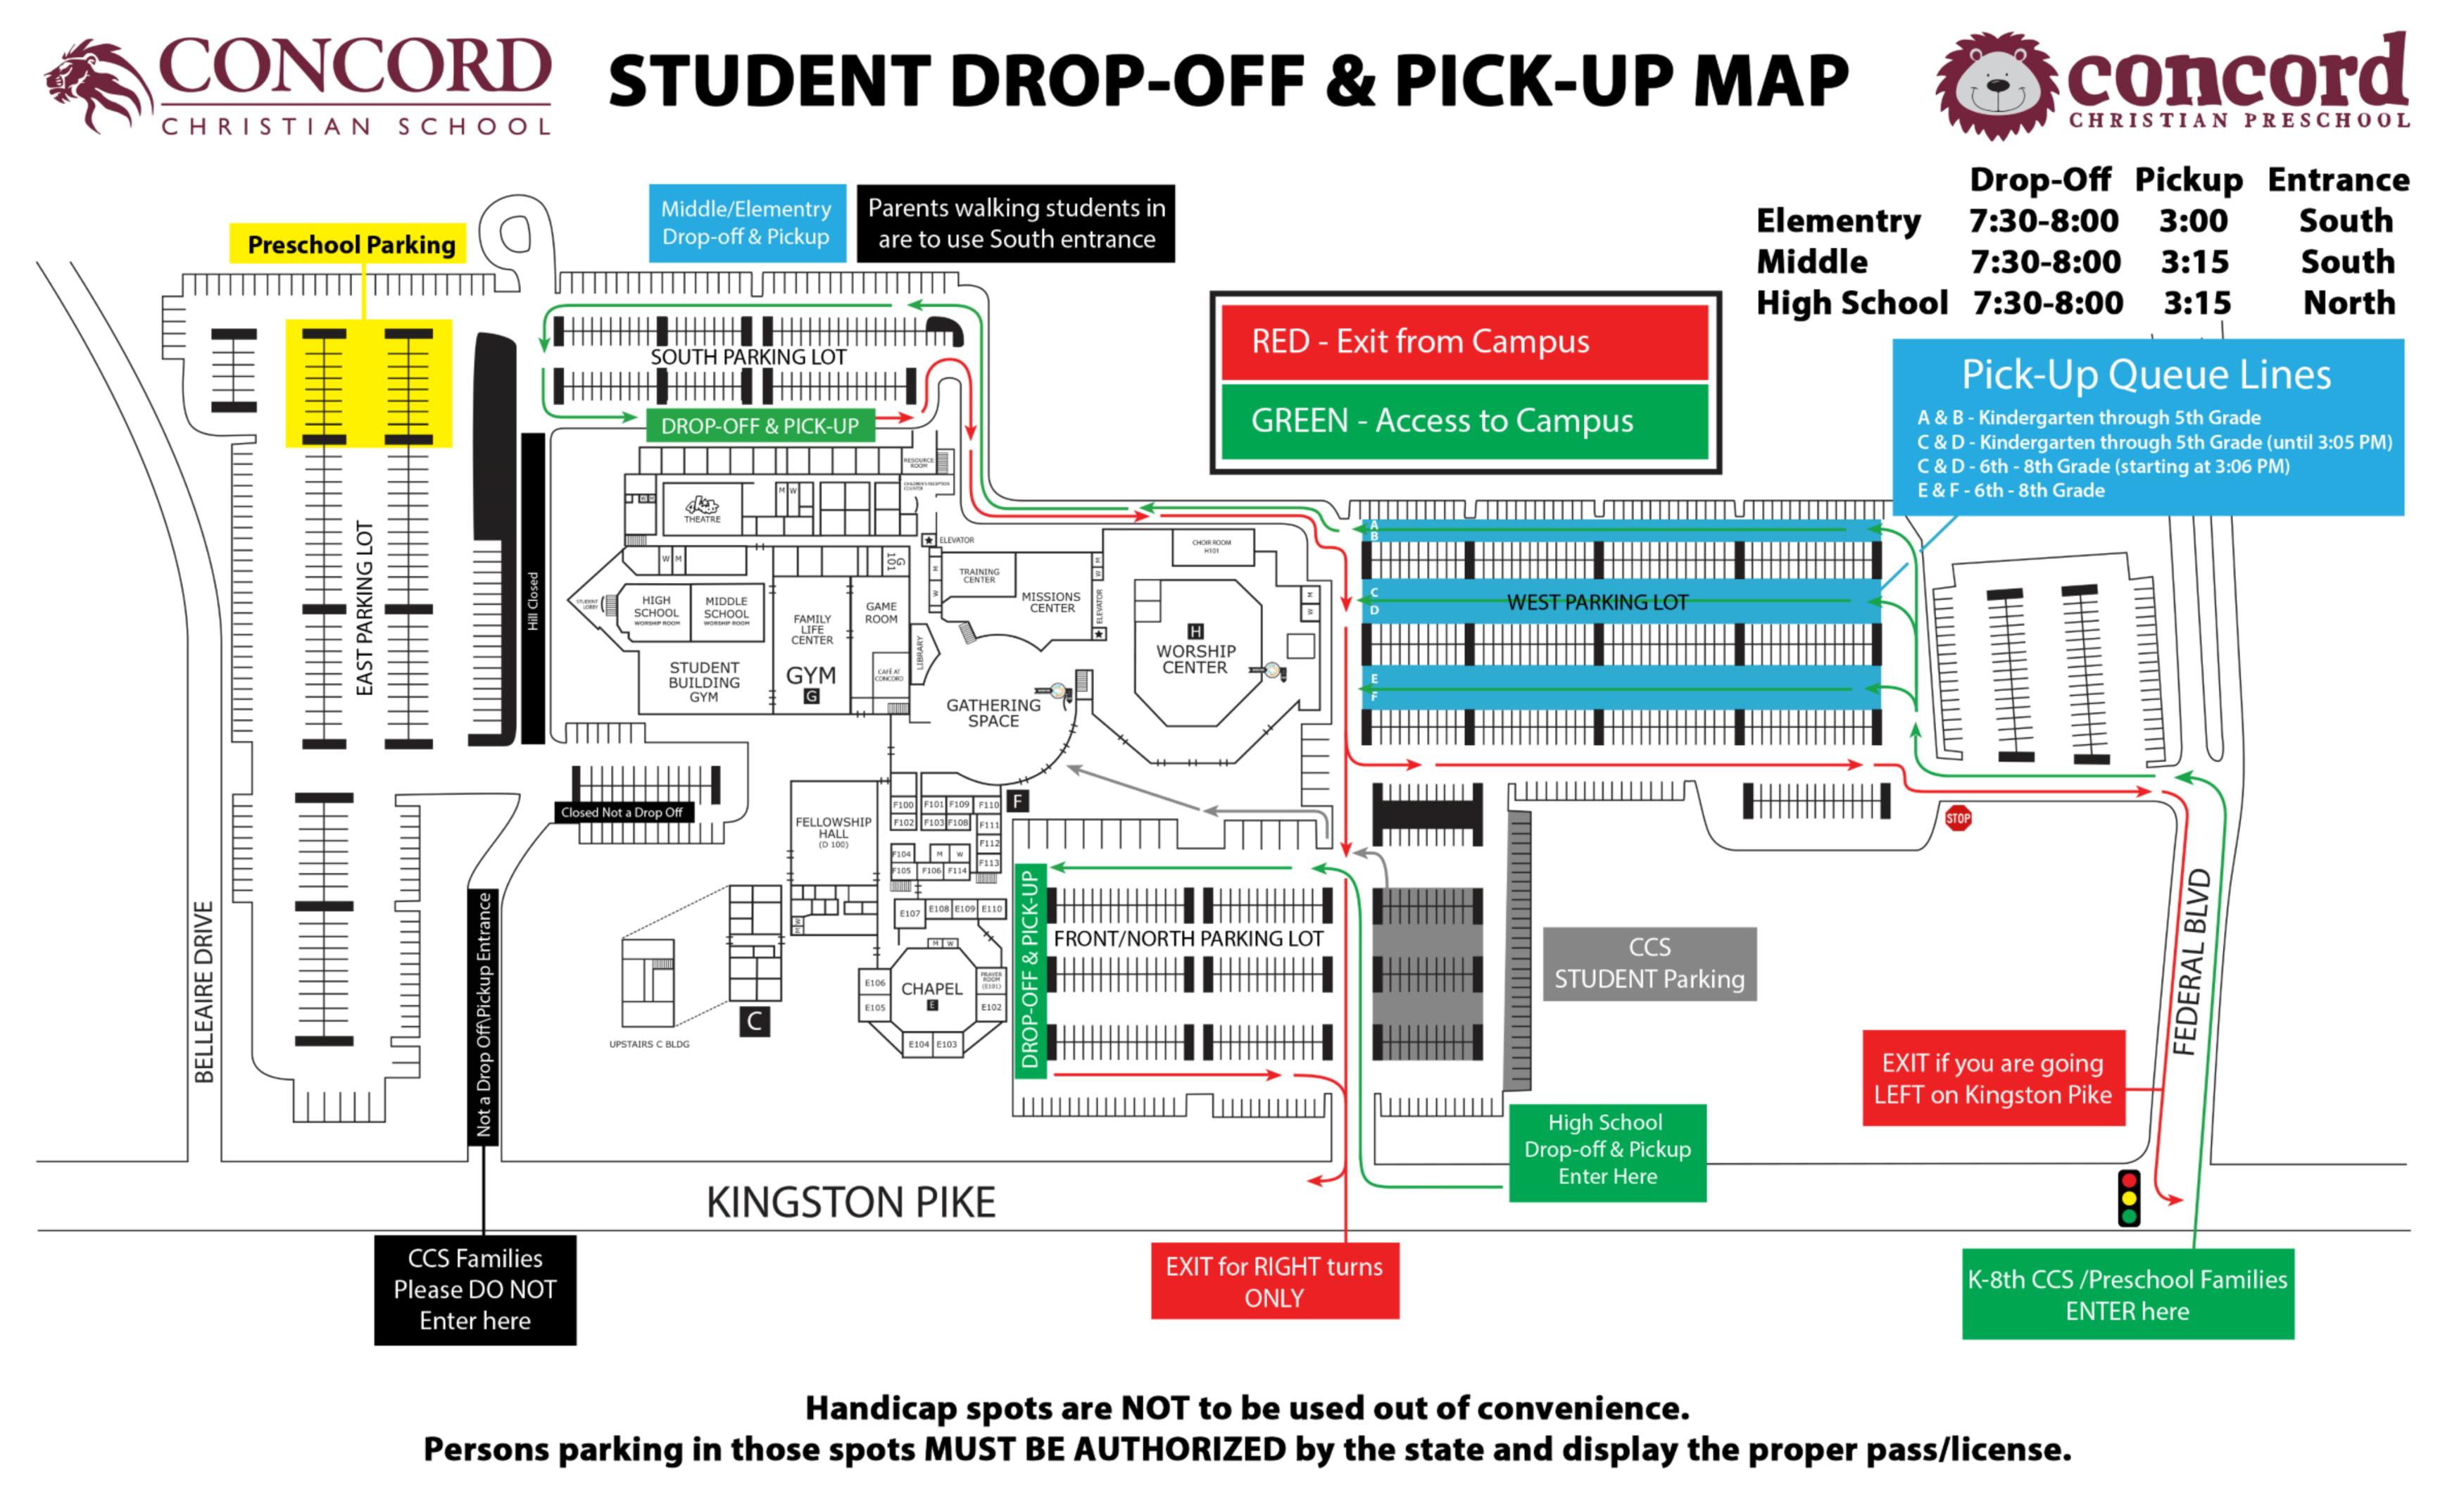 concord campus map Campus Map Concord Christian School concord campus map